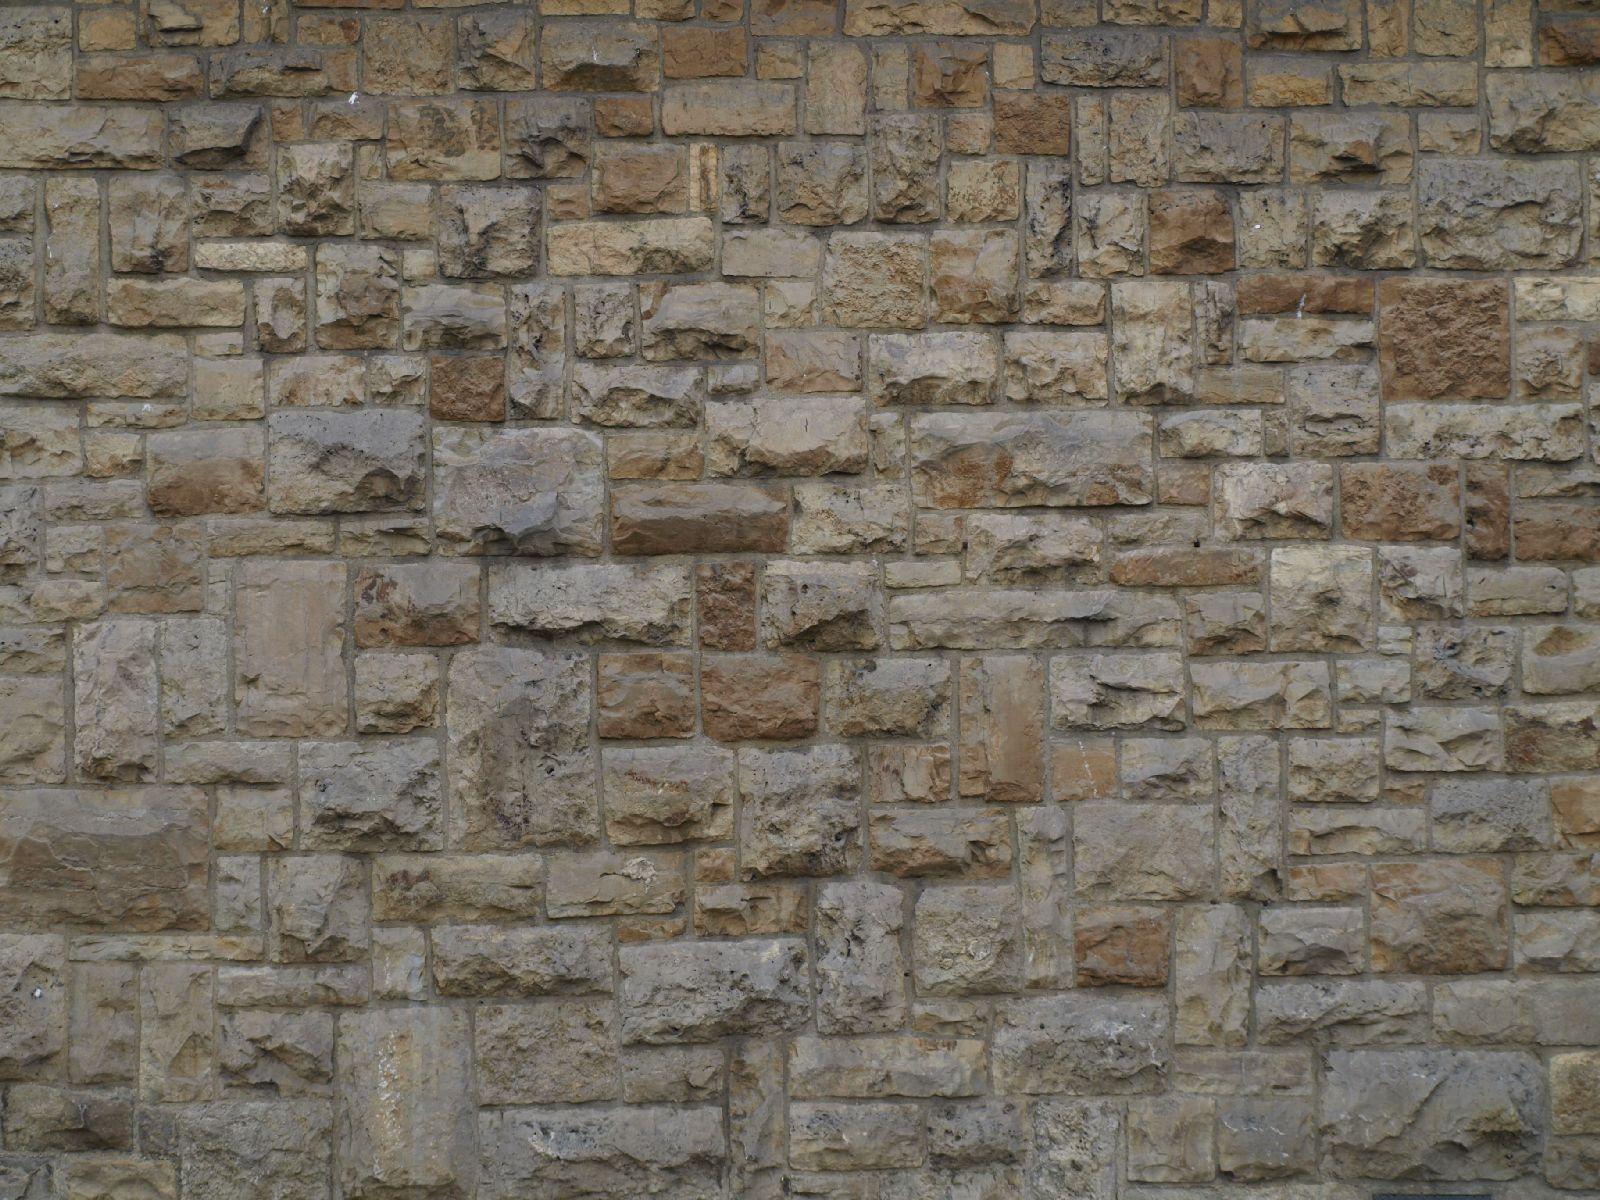 Wand-Bruchstein_Textur_A_PA045695